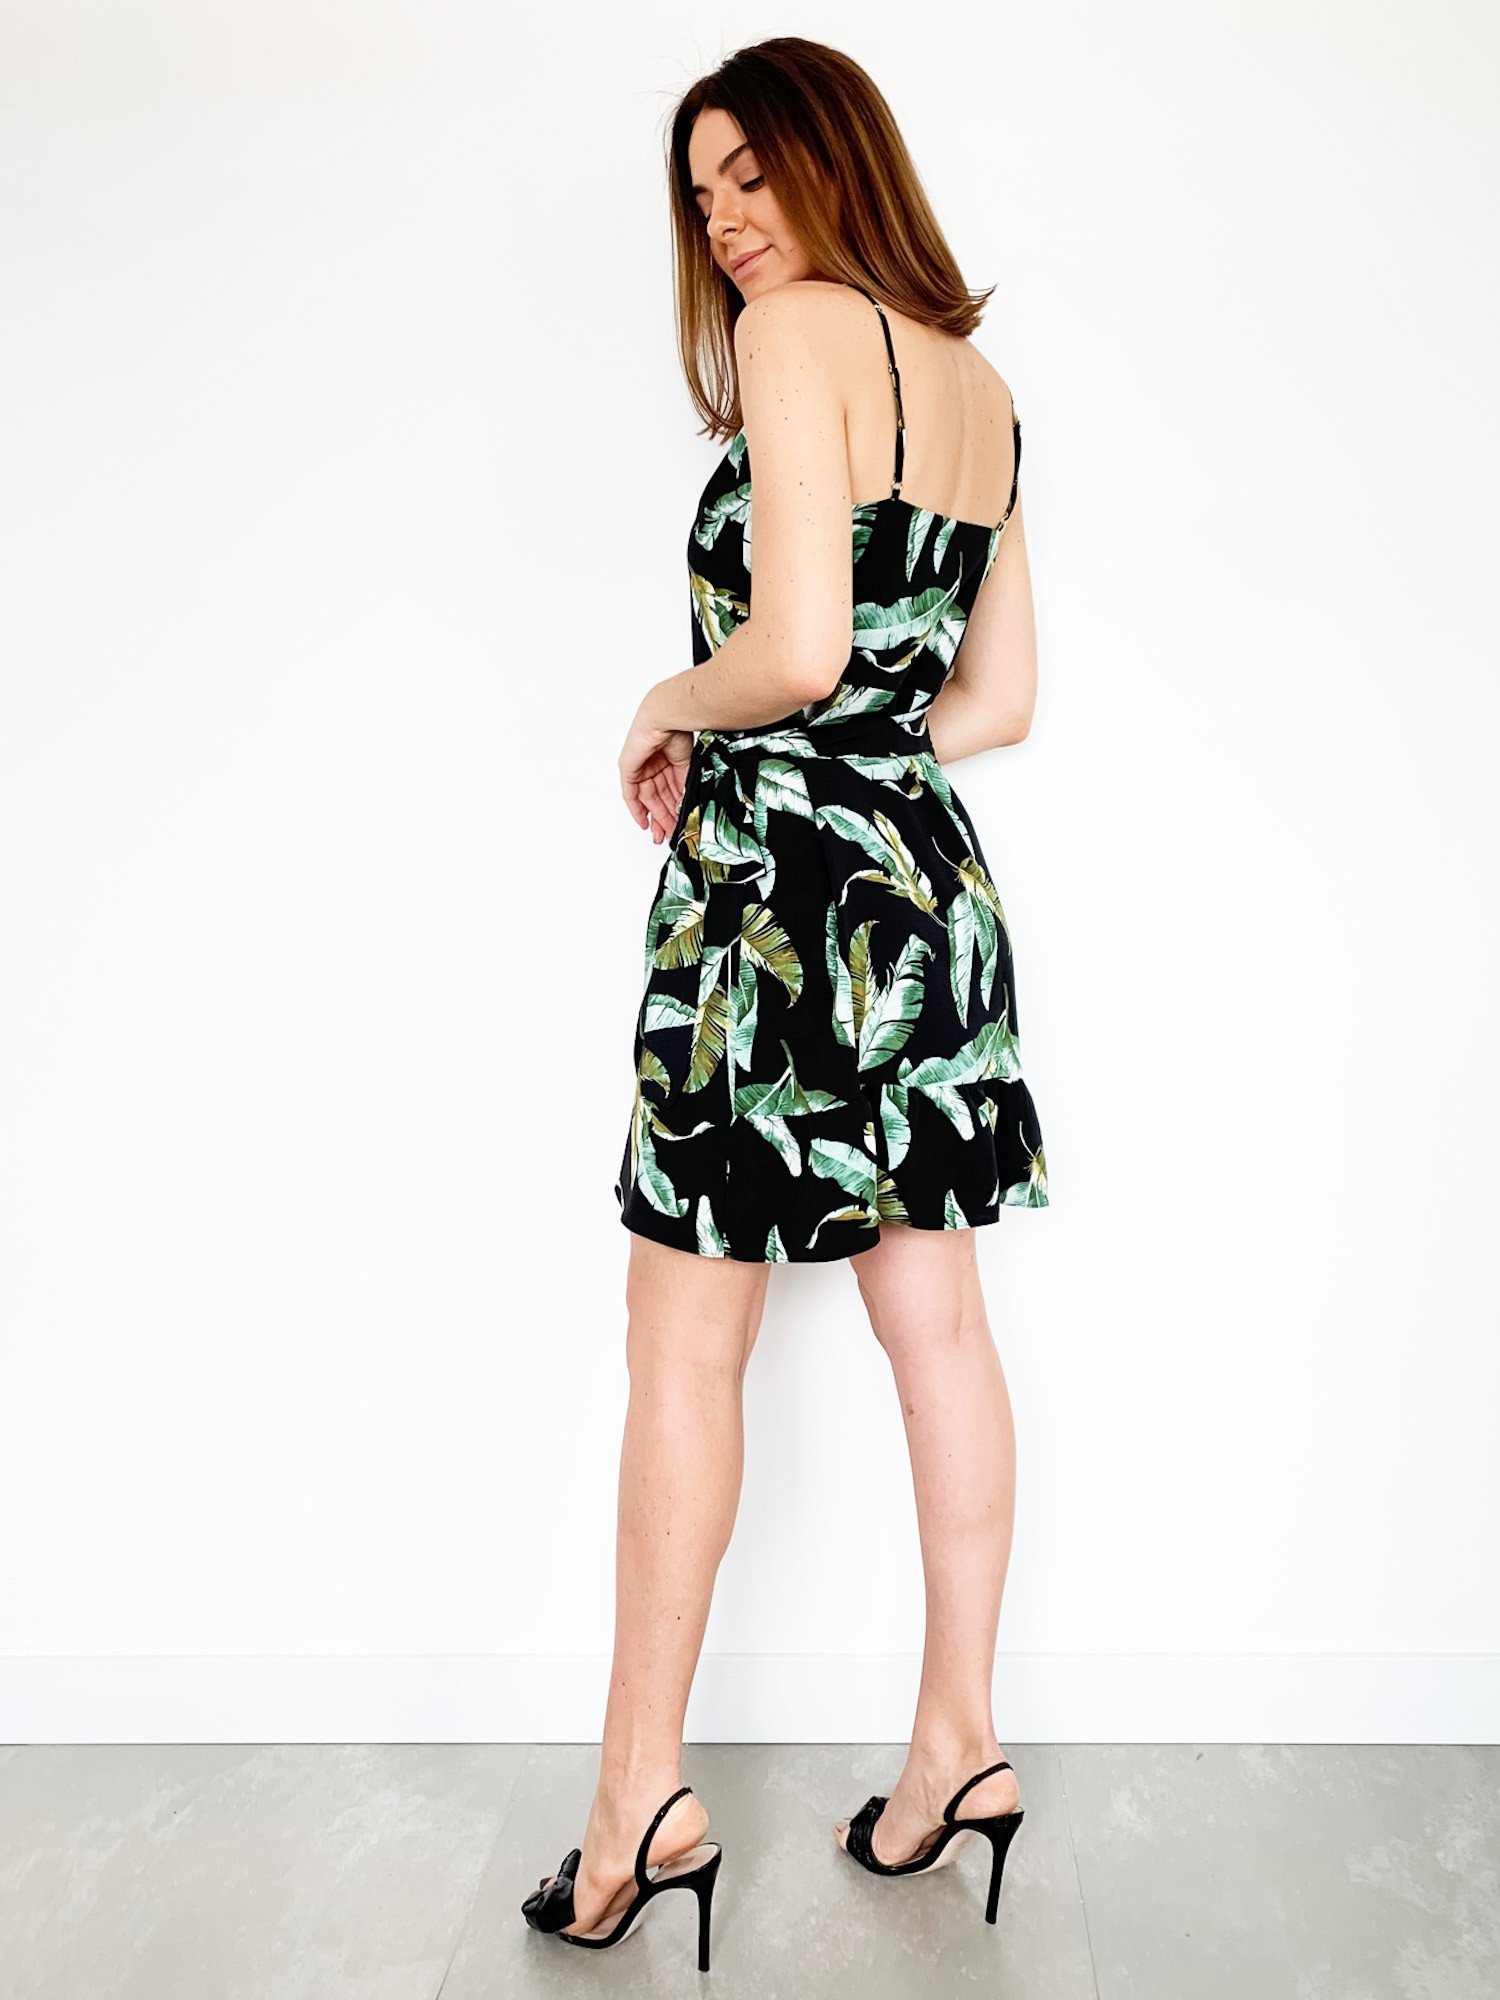 Vestido Estampado Gabi - Preto e Verde